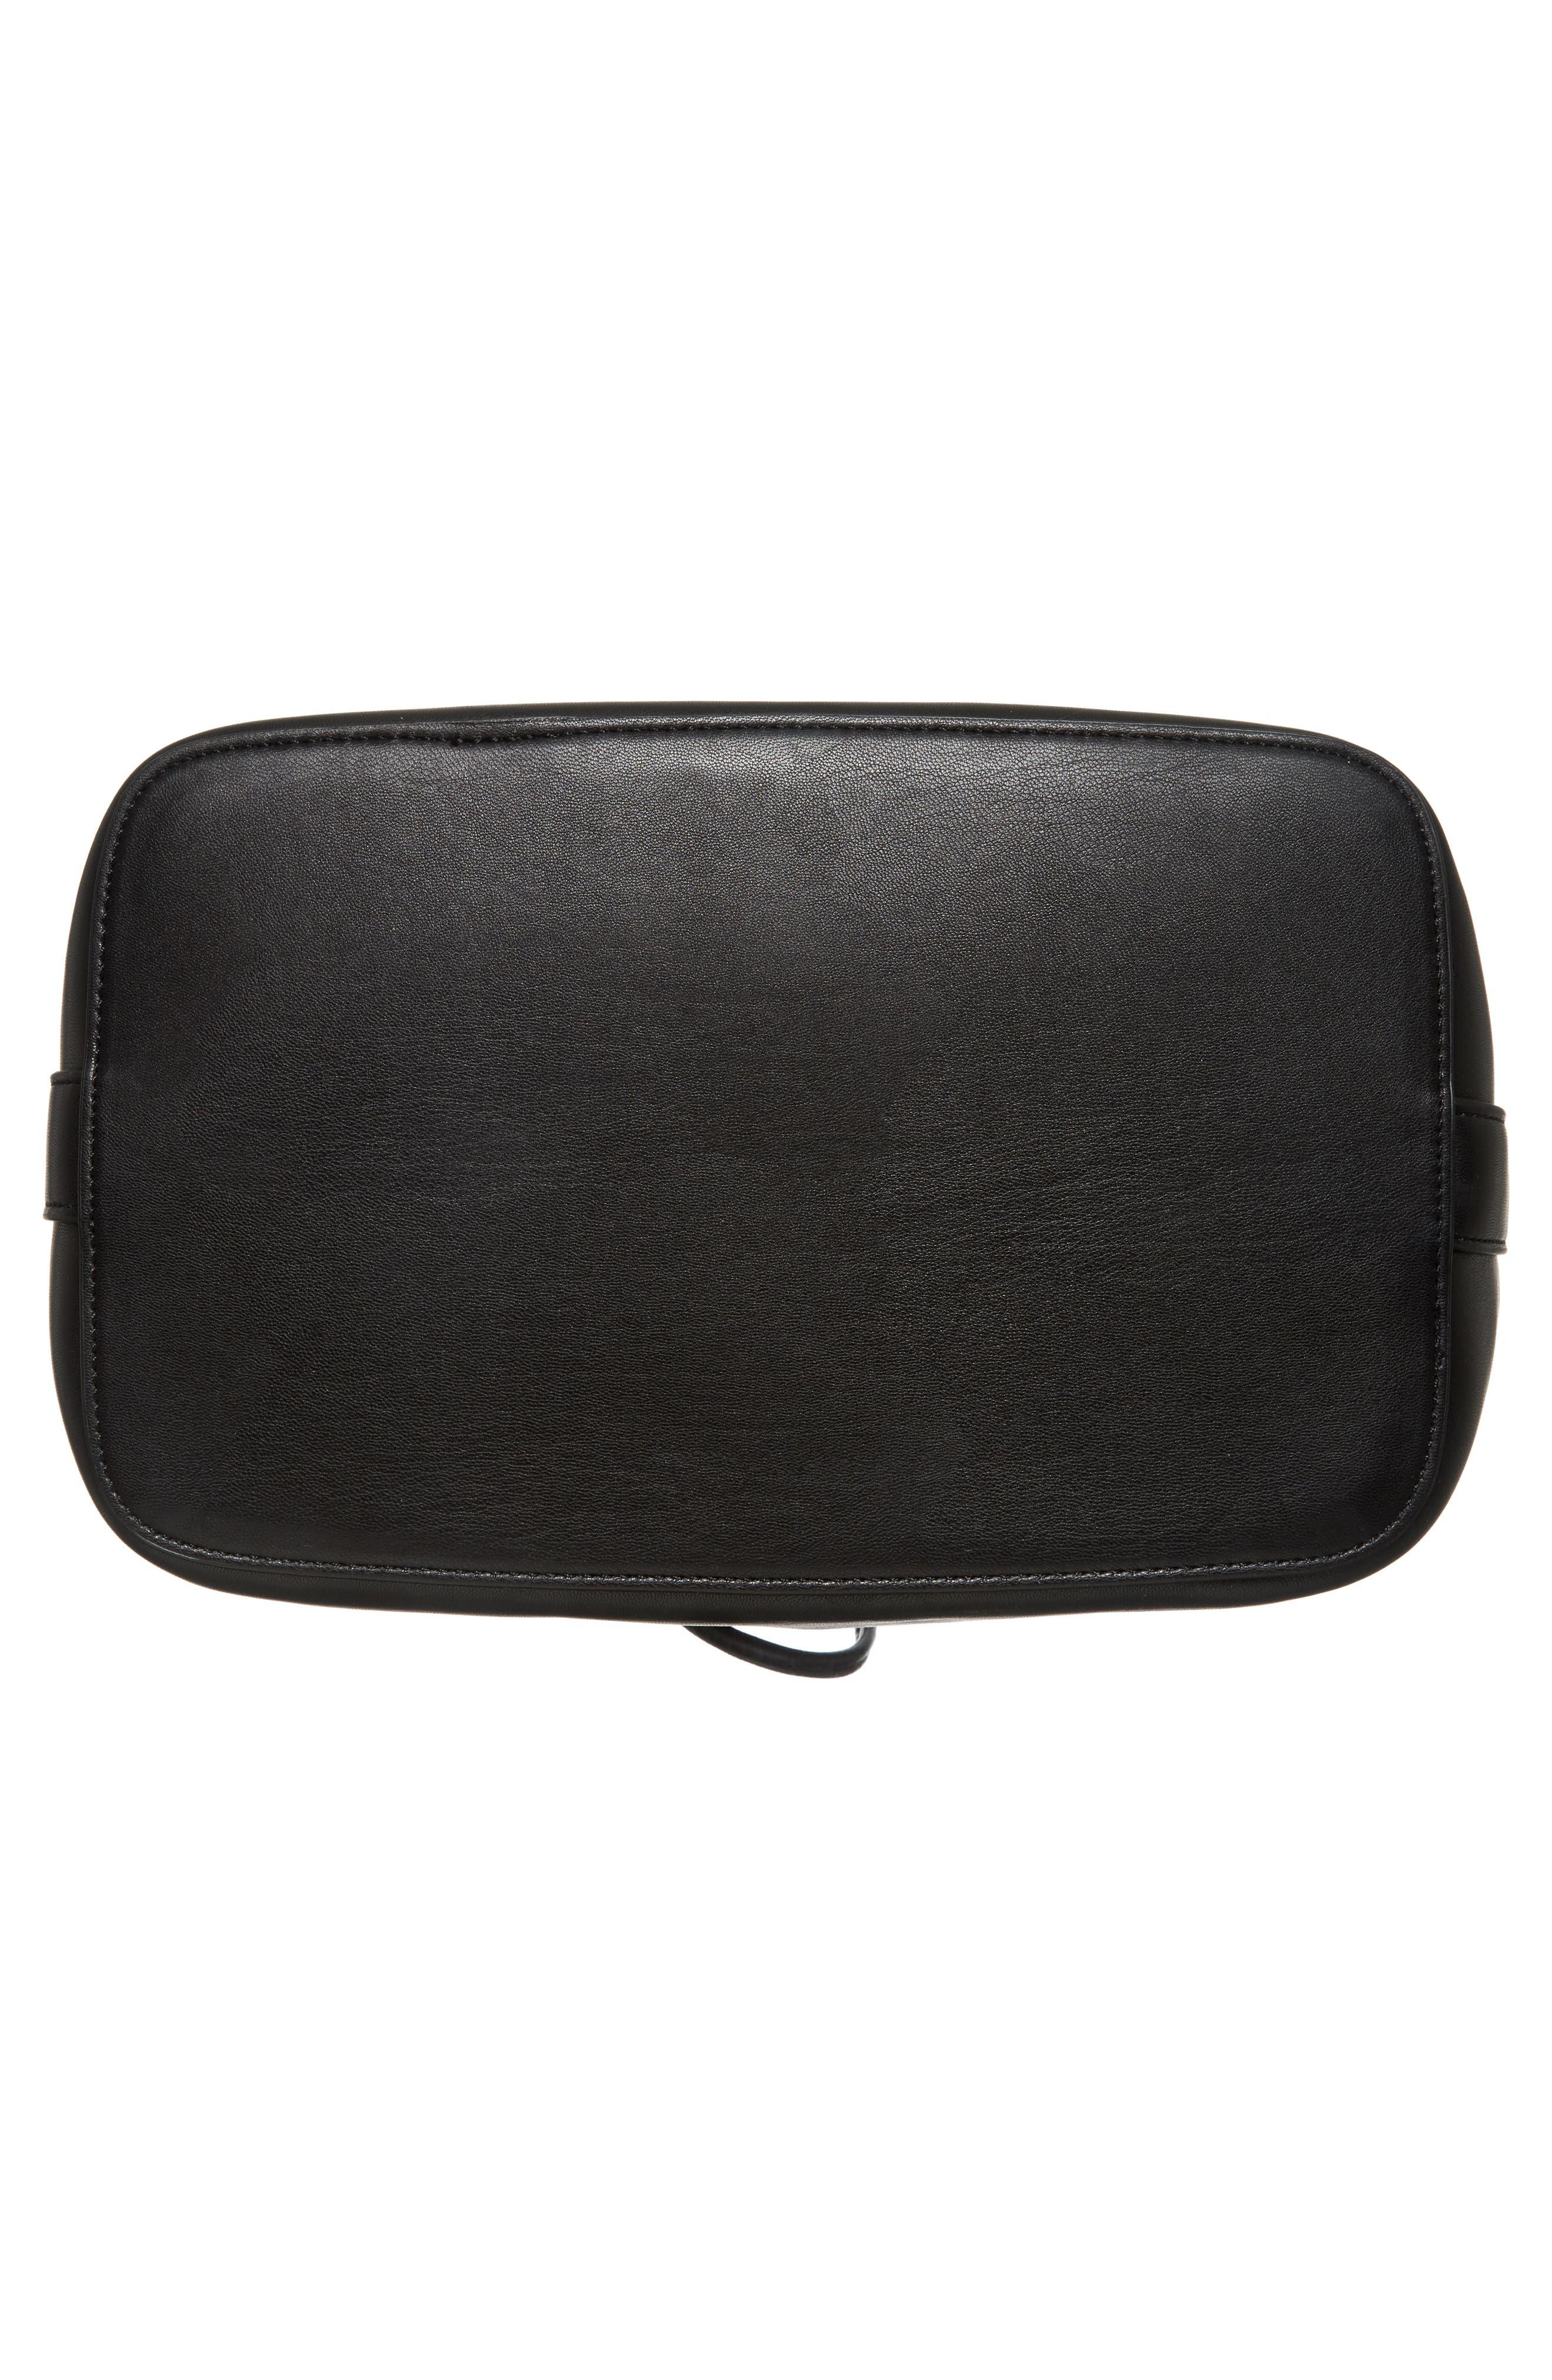 Stella Faux Leather Bucket Bag,                             Alternate thumbnail 6, color,                             001